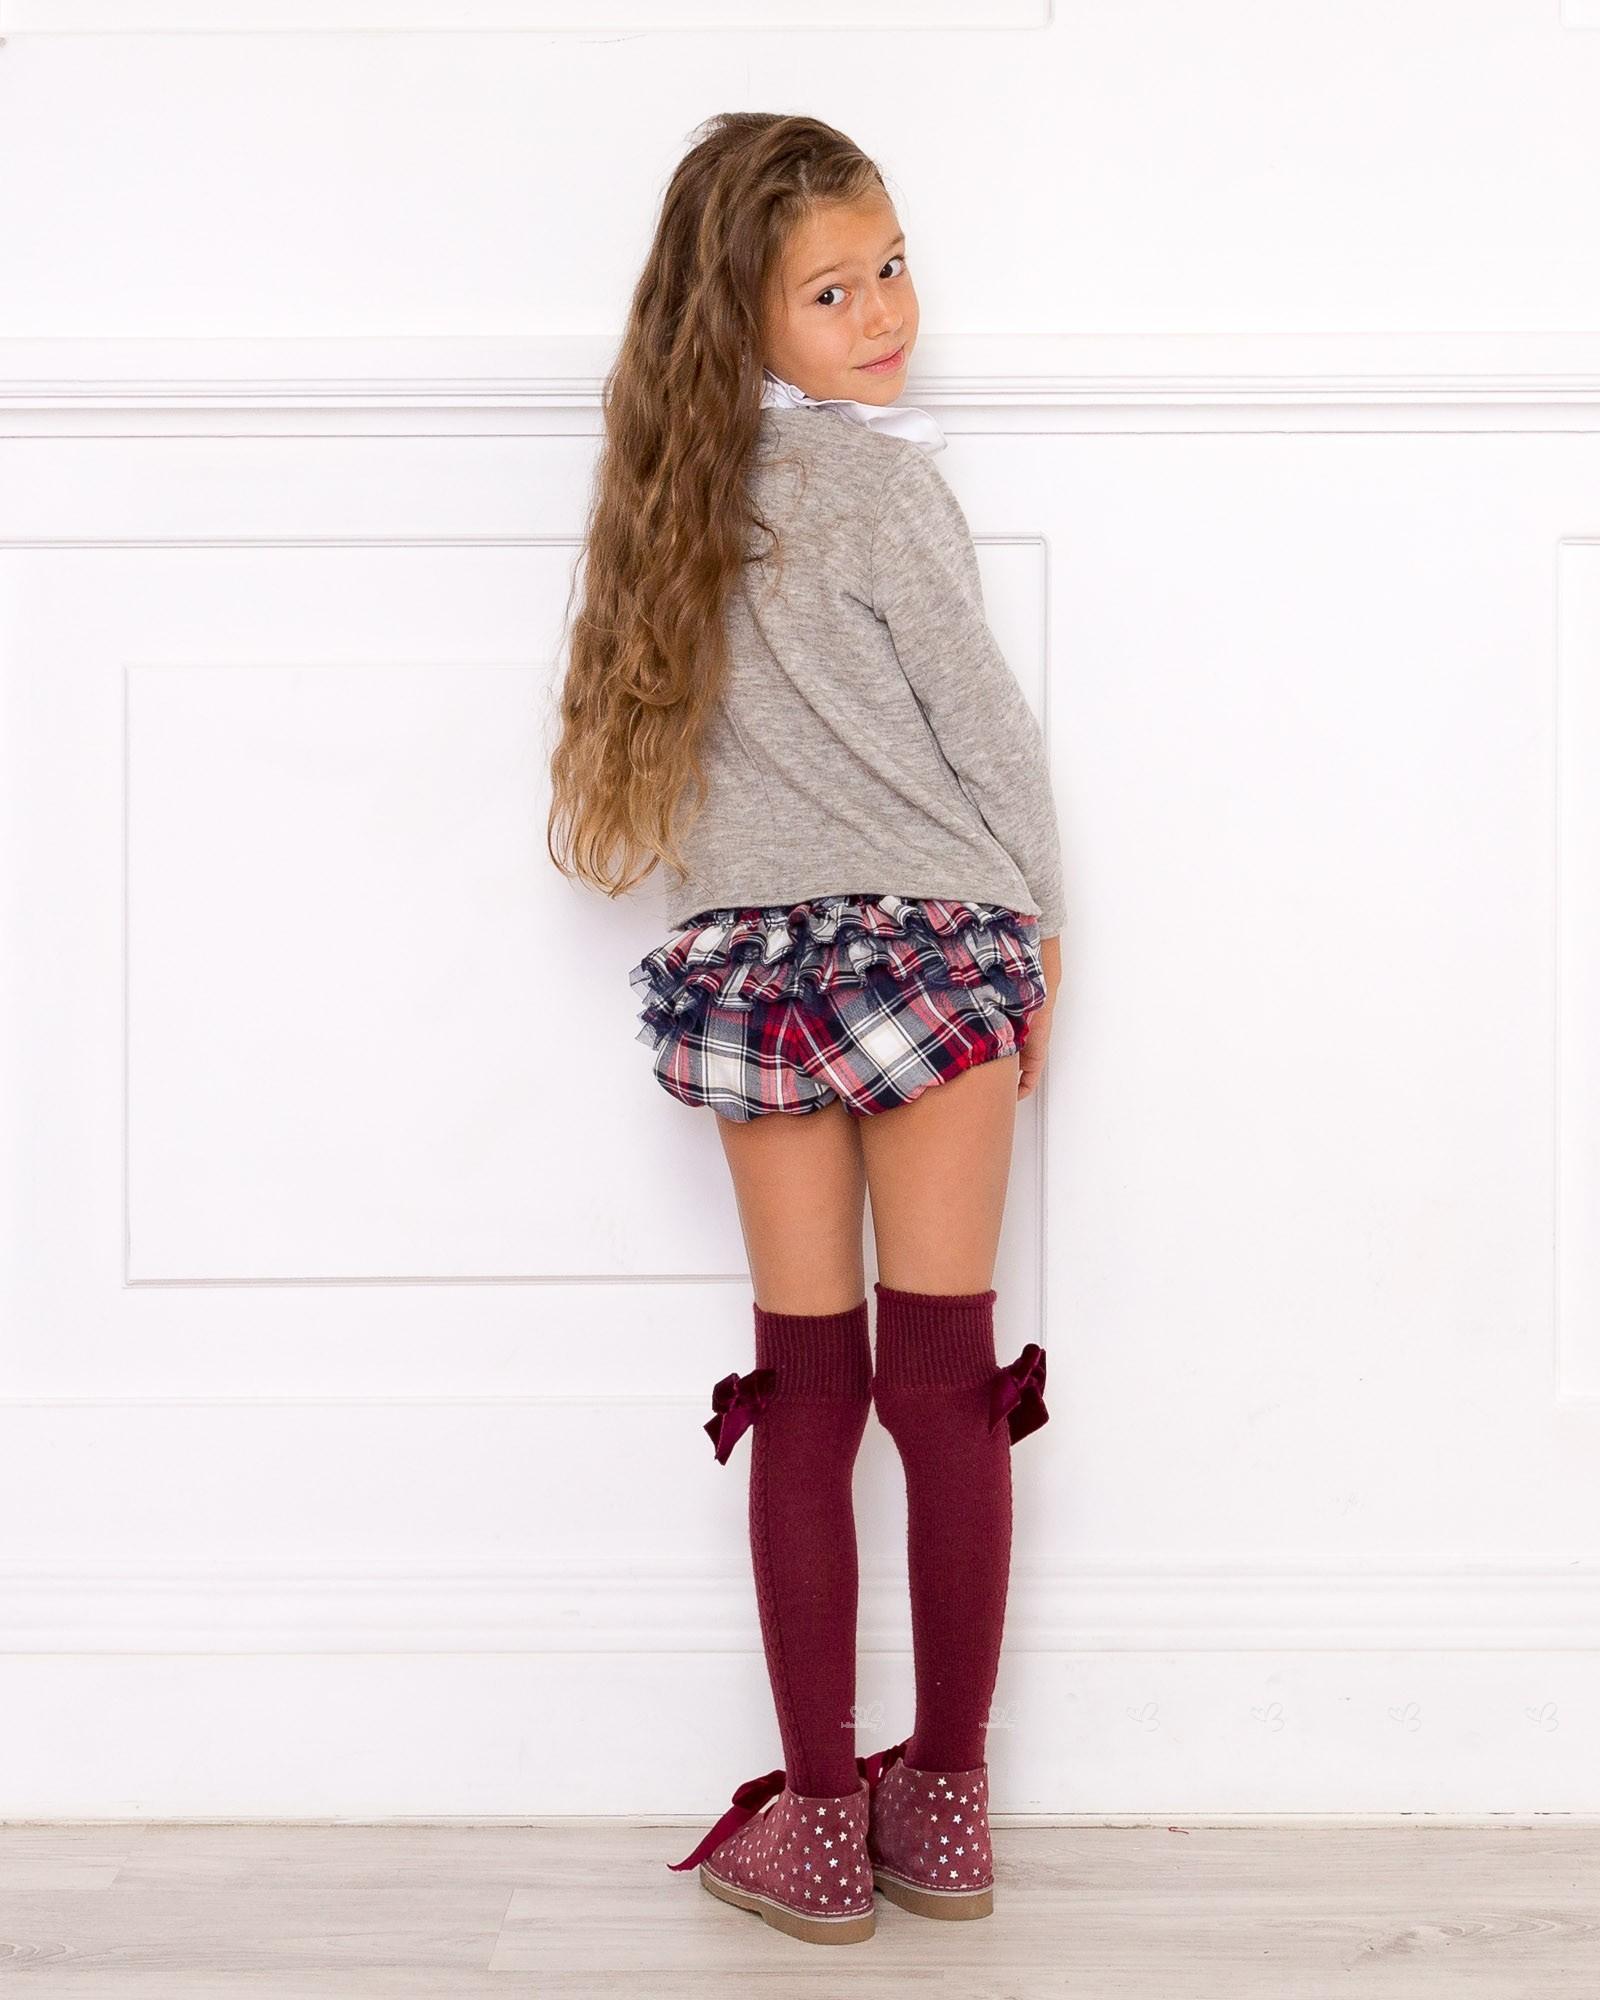 Veggie xxx very young little schoolgirl naked american teen